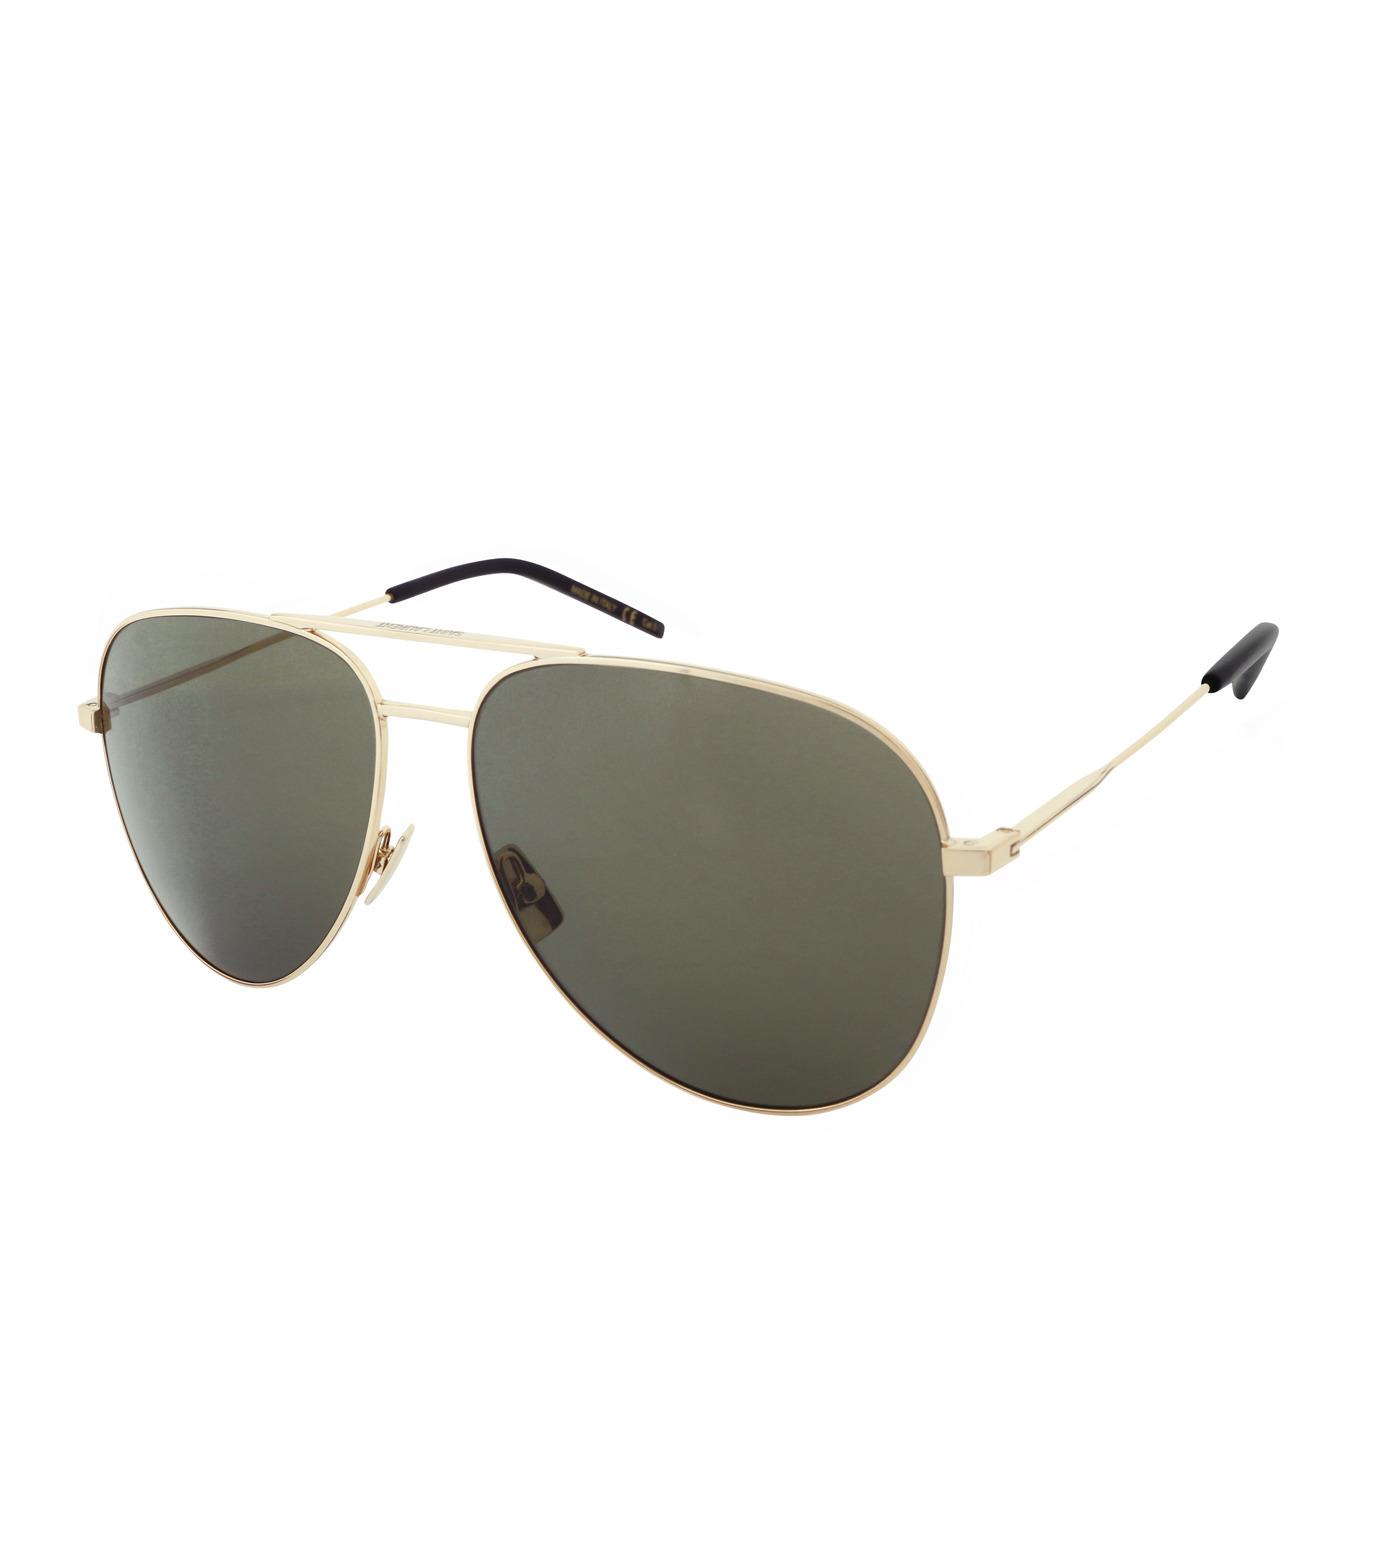 SAINT LAURENT(サンローラン)のTeardrop-GOLD(アイウェア/eyewear)-419695-Y9910-2 拡大詳細画像1